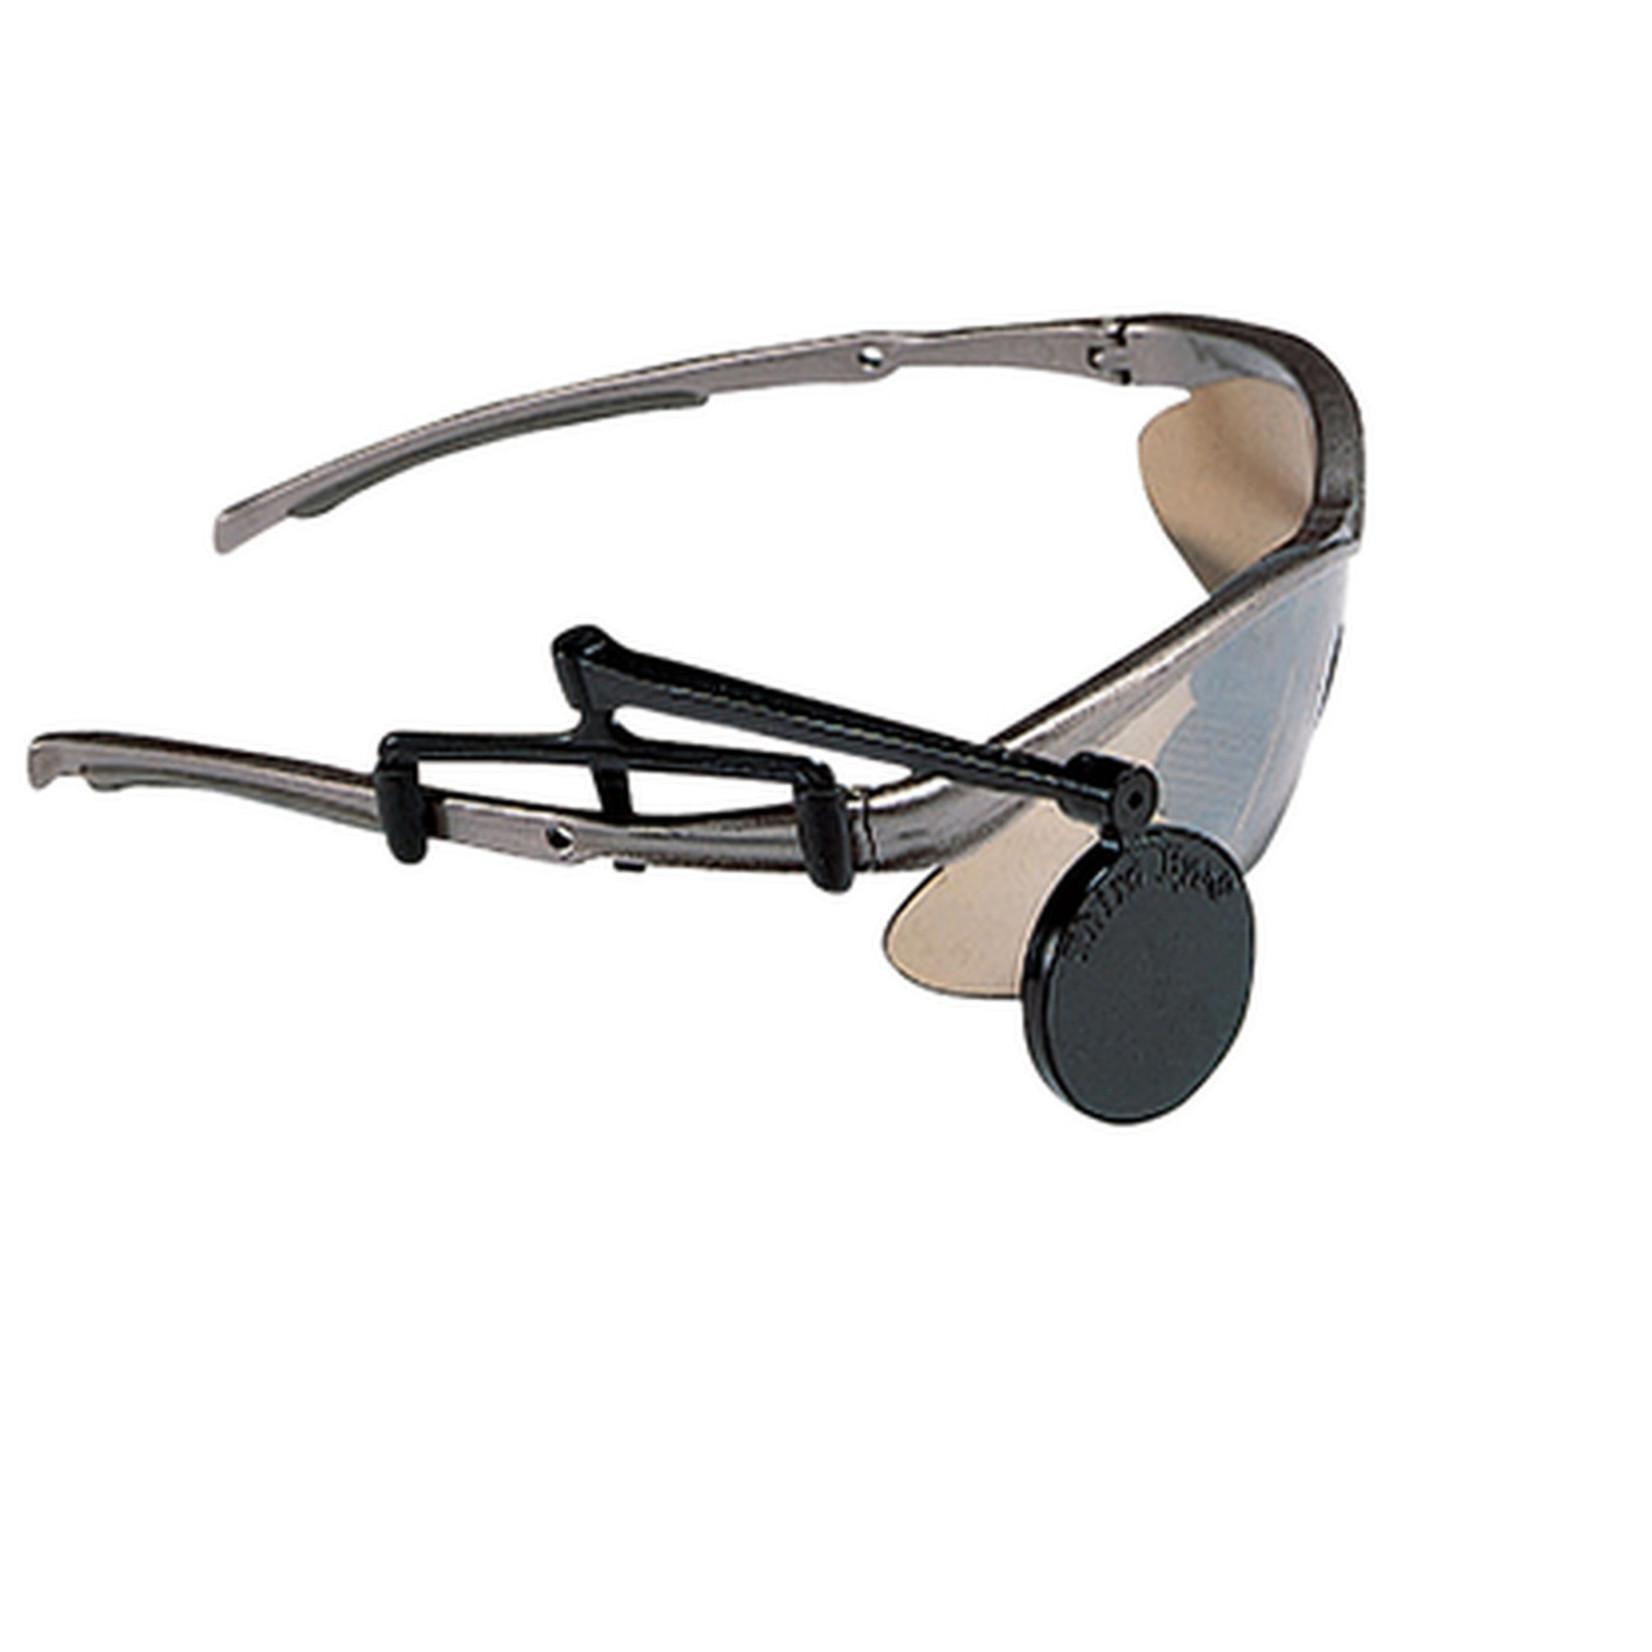 Clip-On Eyeglass Mirror